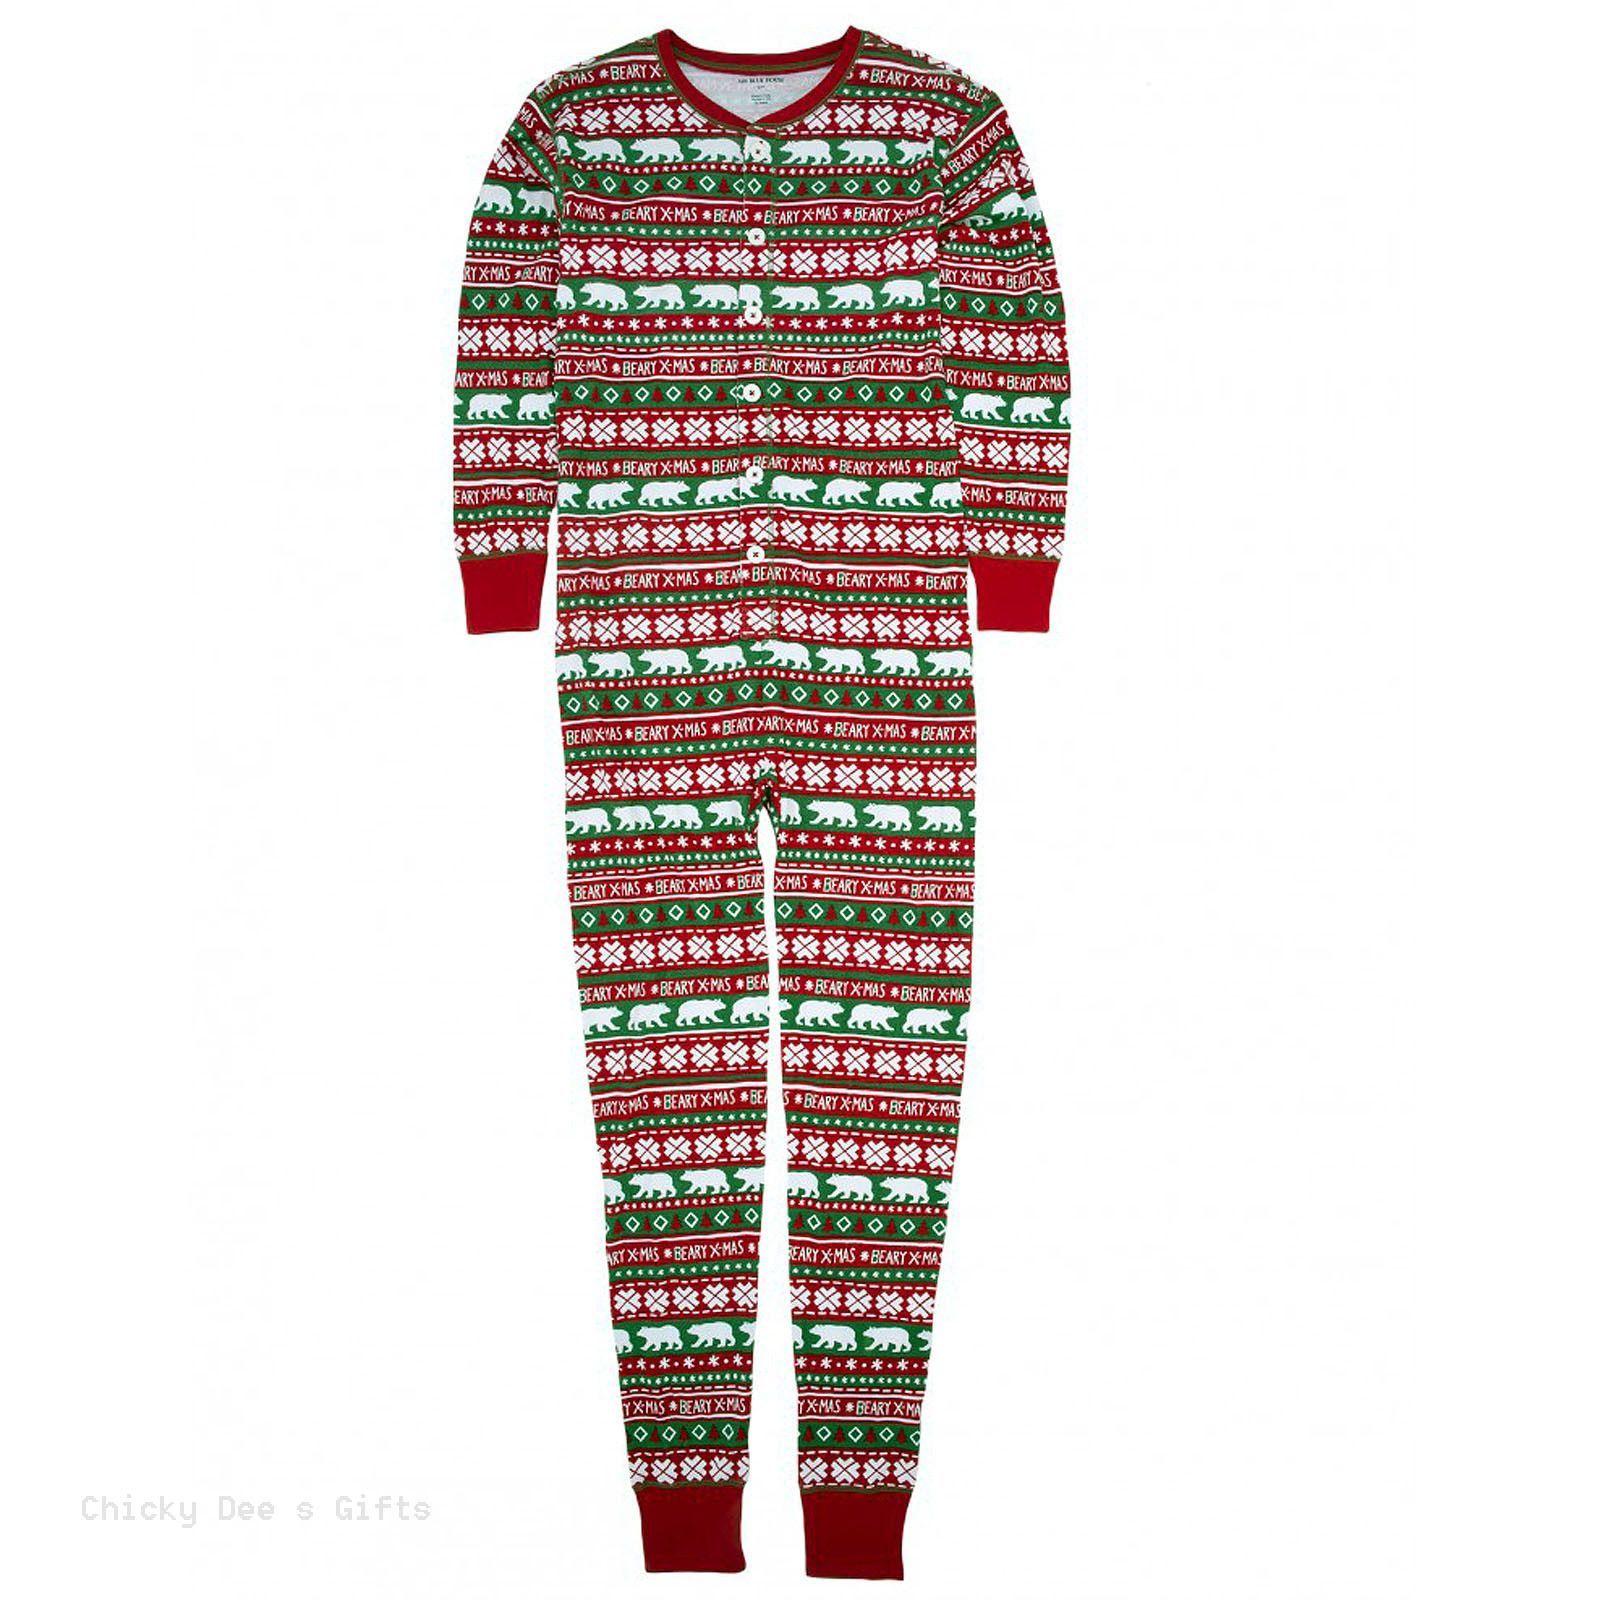 Hatley Adult Union Suit BEARY XMAS sleep top PJ Christmas